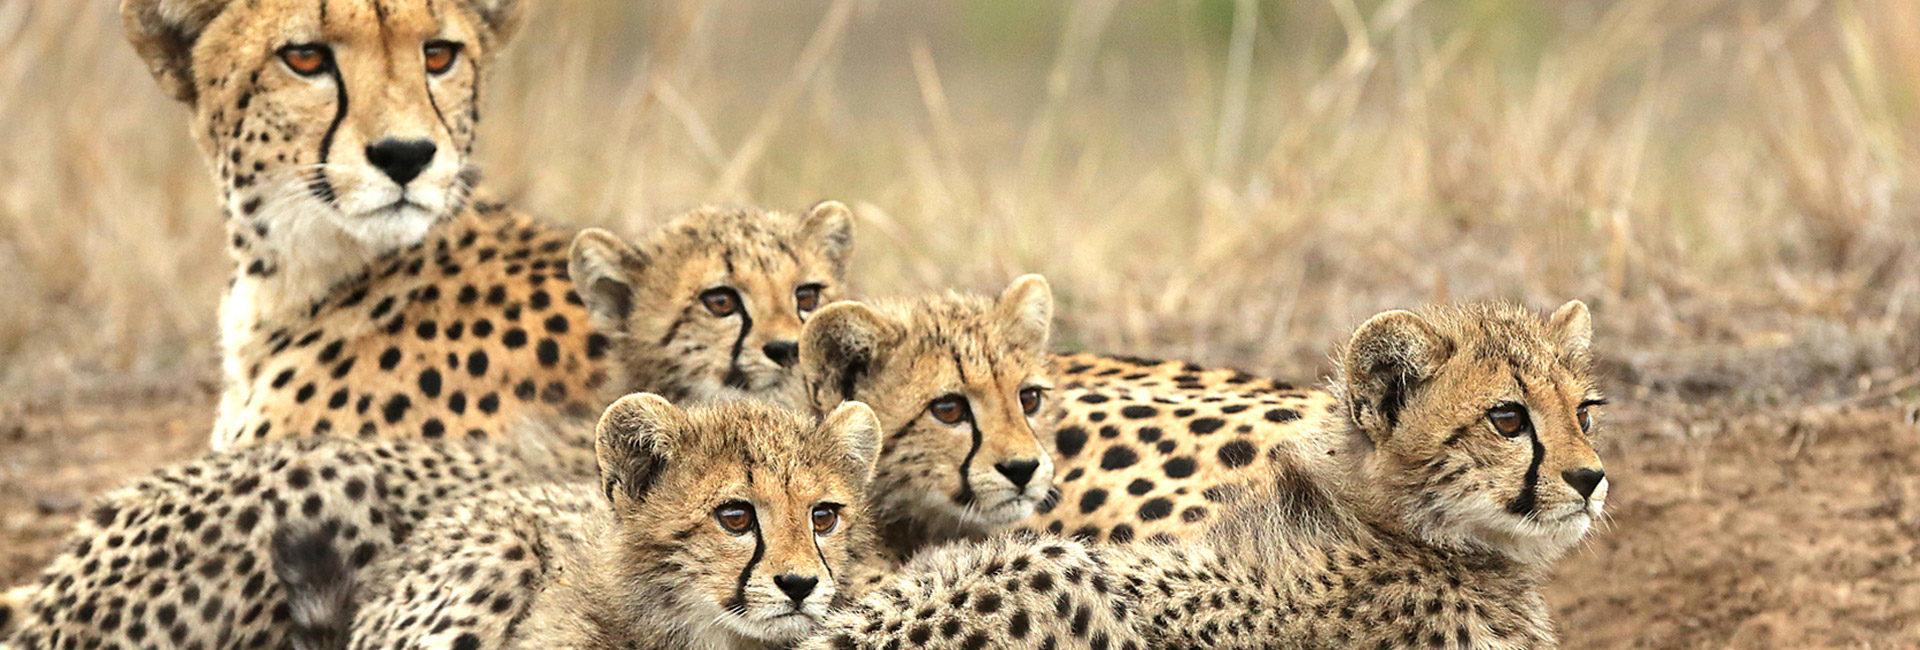 World-class wildlife sightings